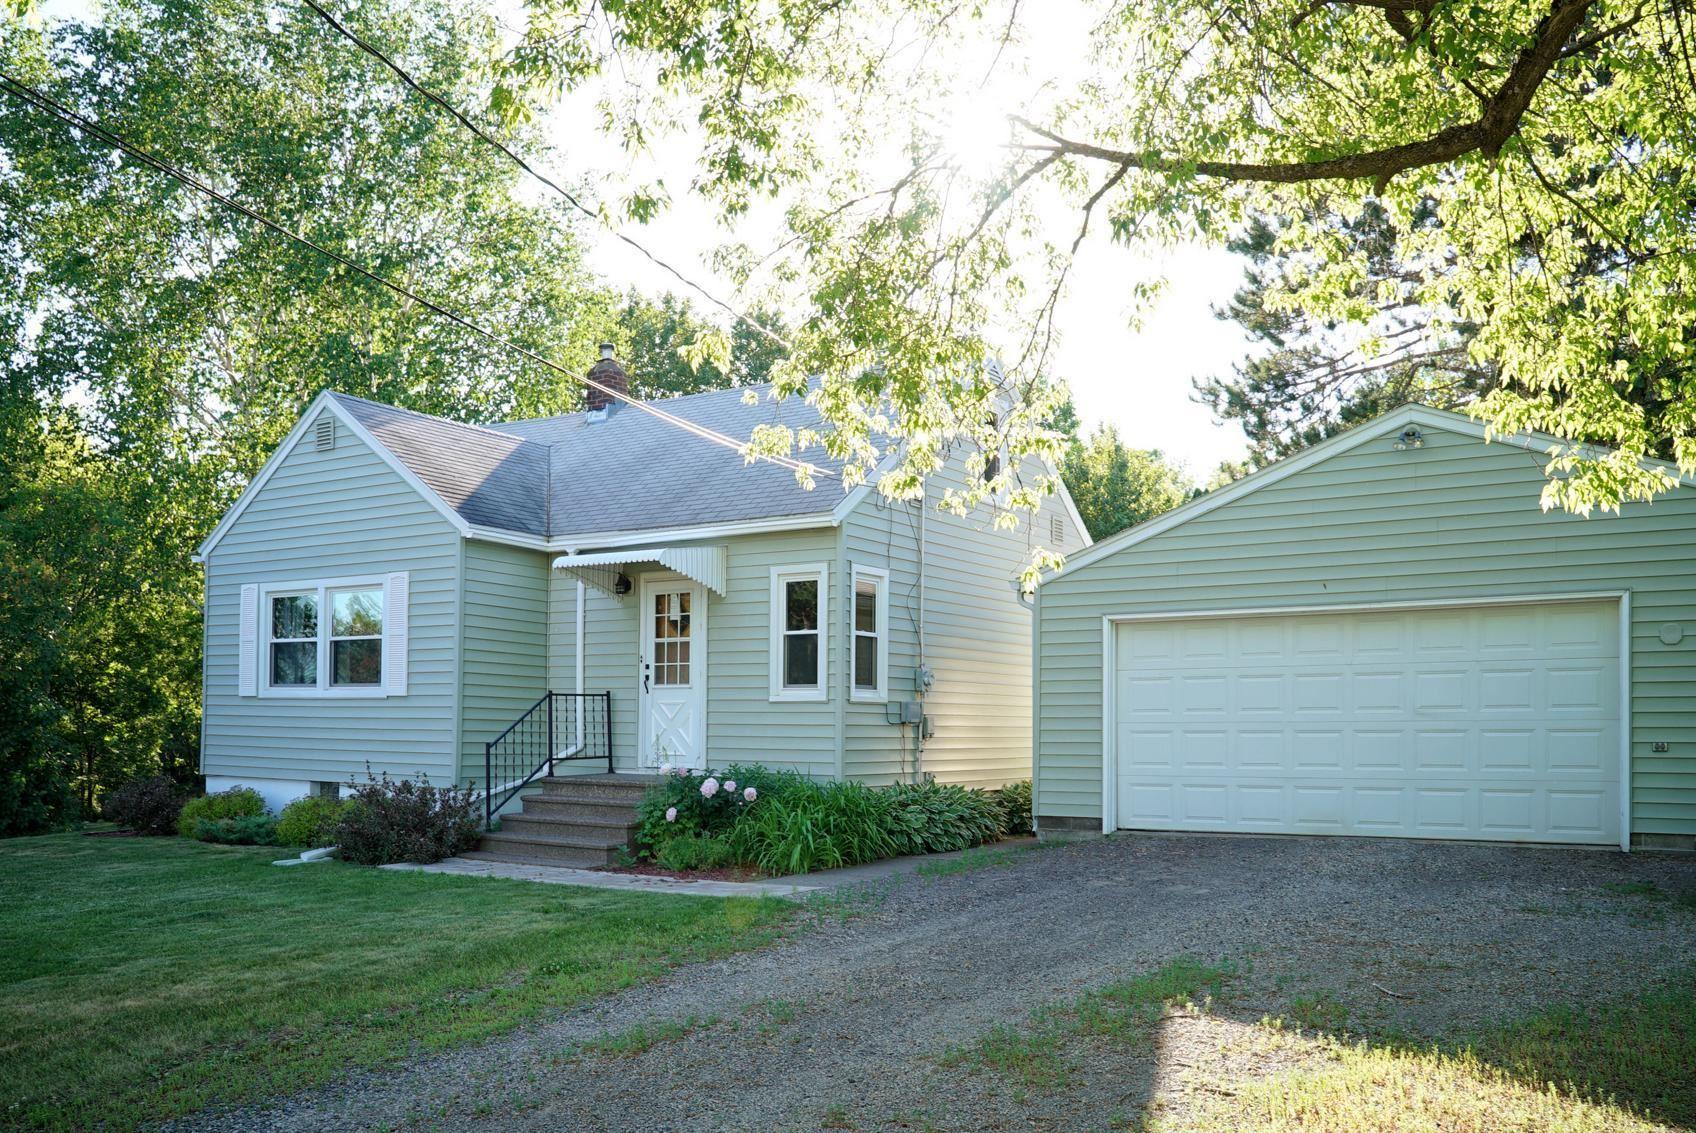 1815 Springvale Road, Duluth, MN 55811 - #: 5615855